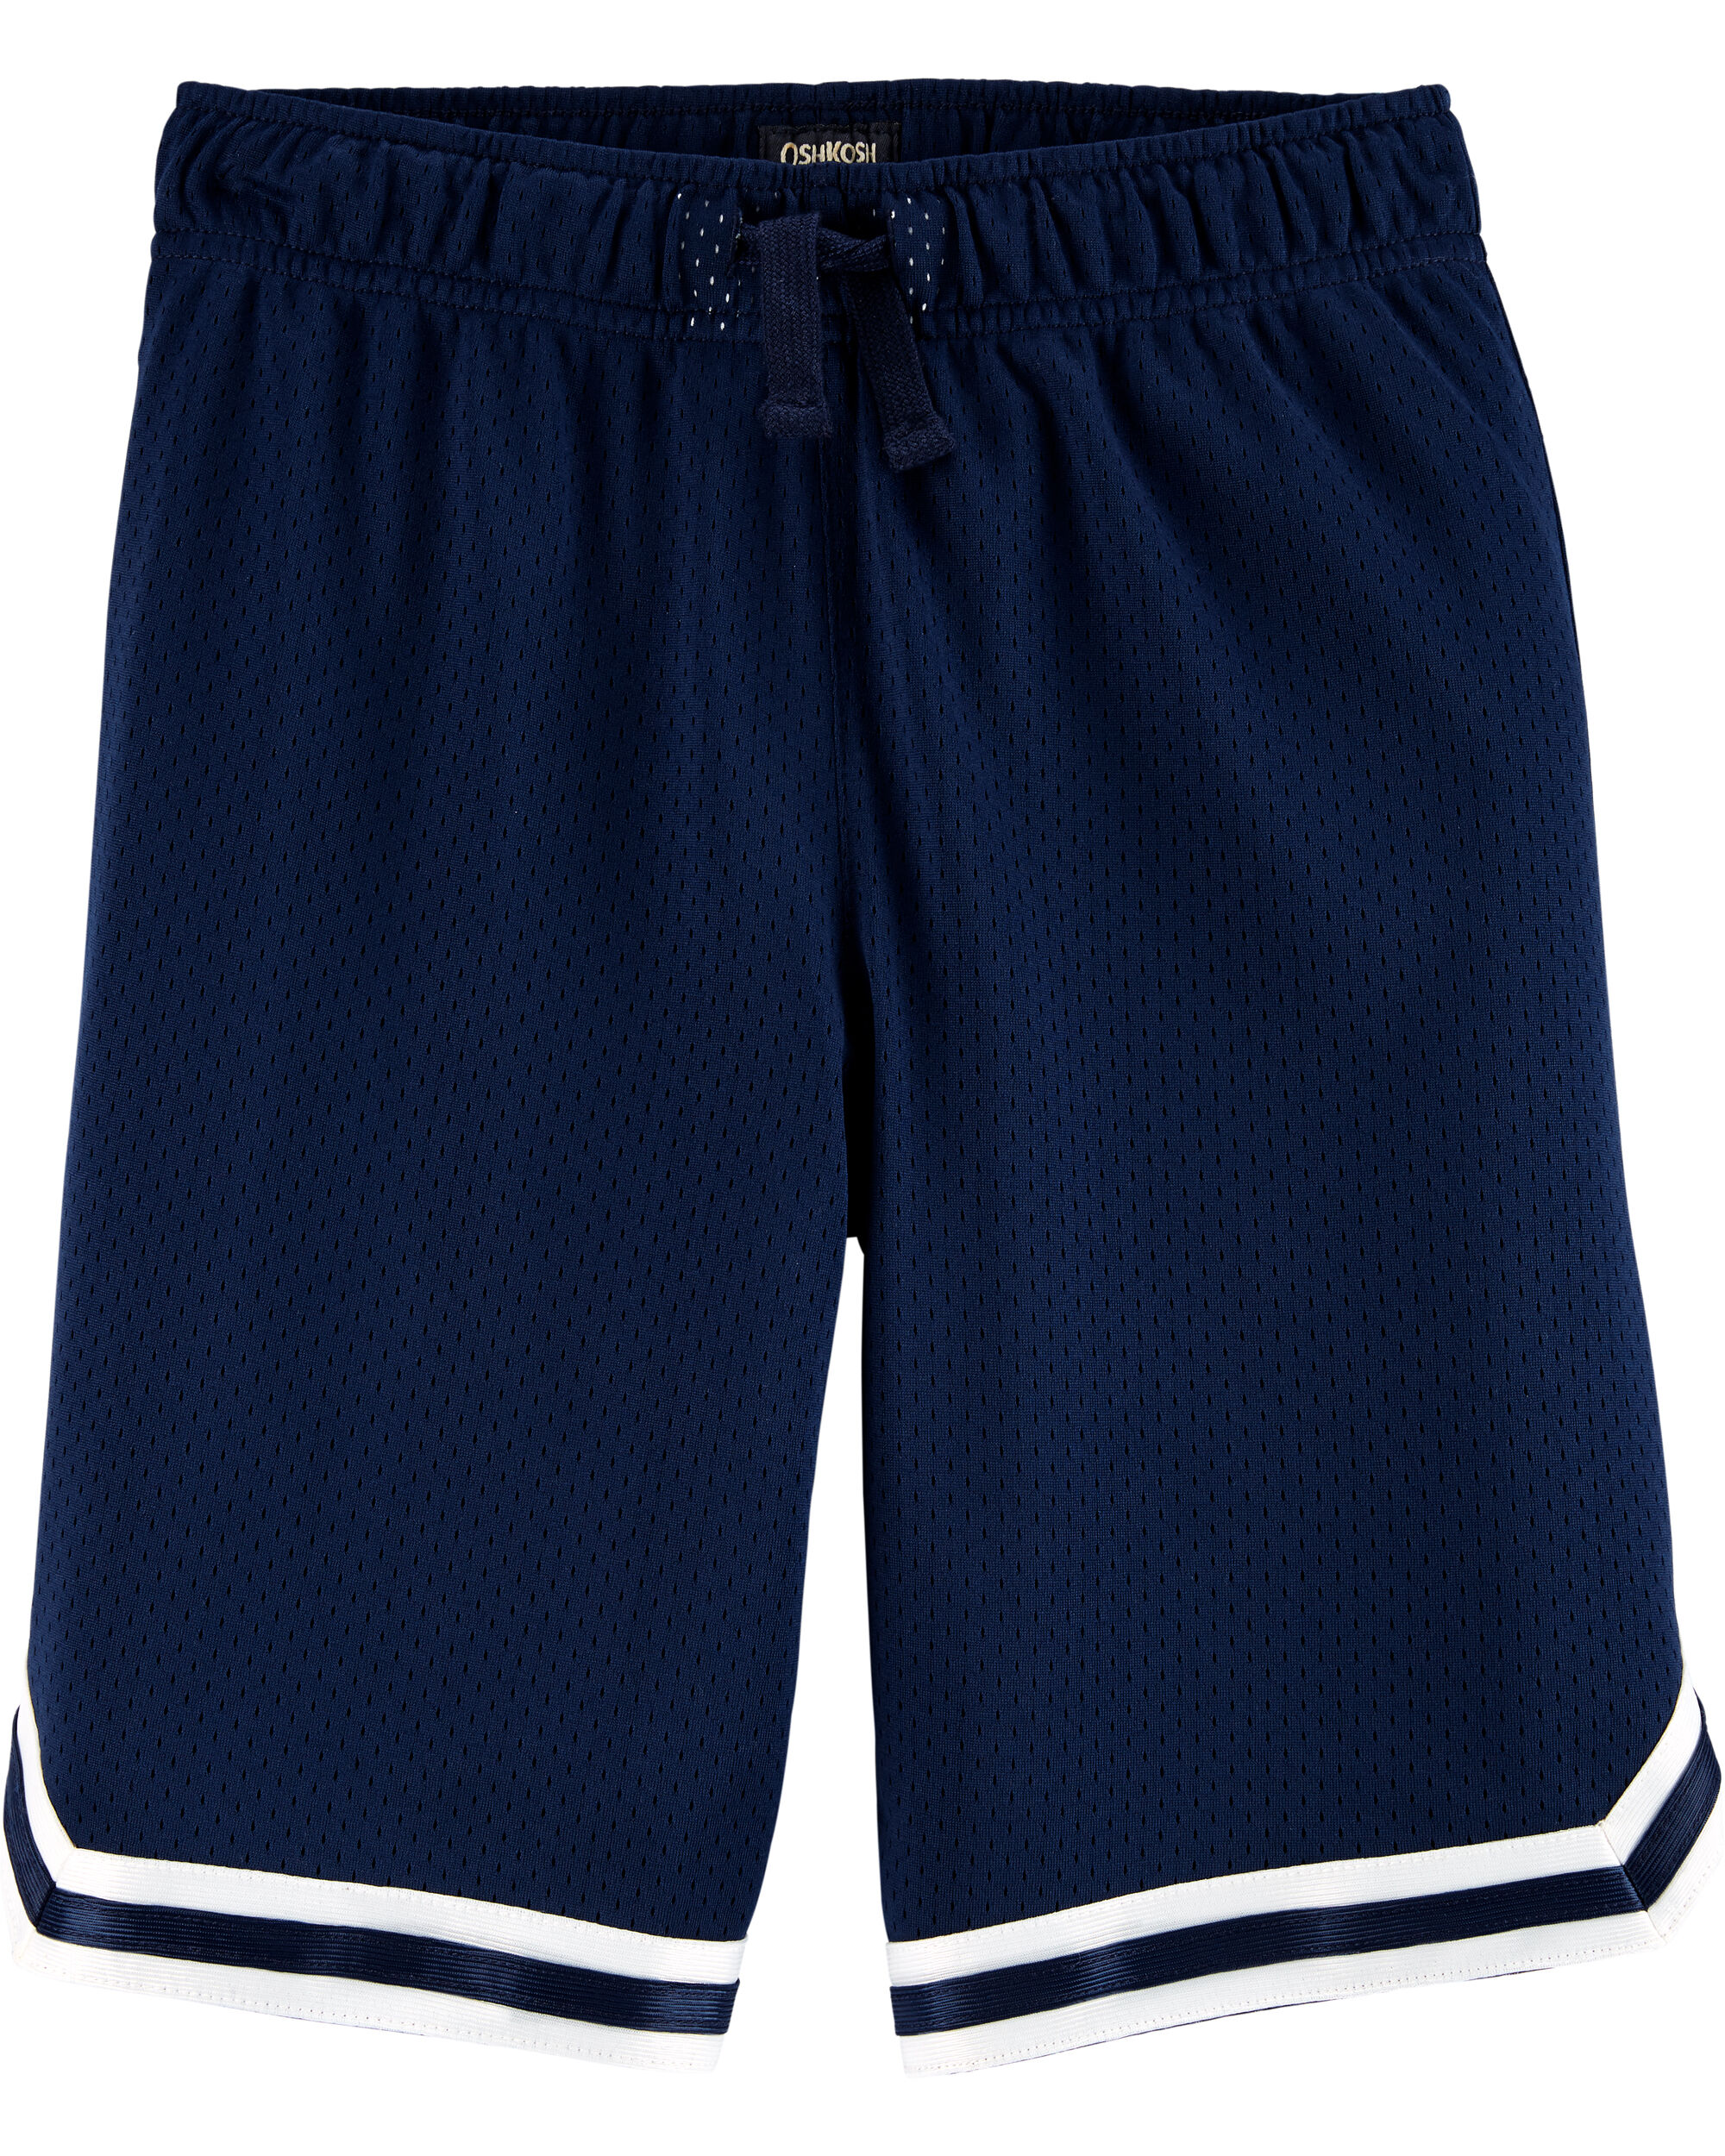 Mesh Basketball Shorts